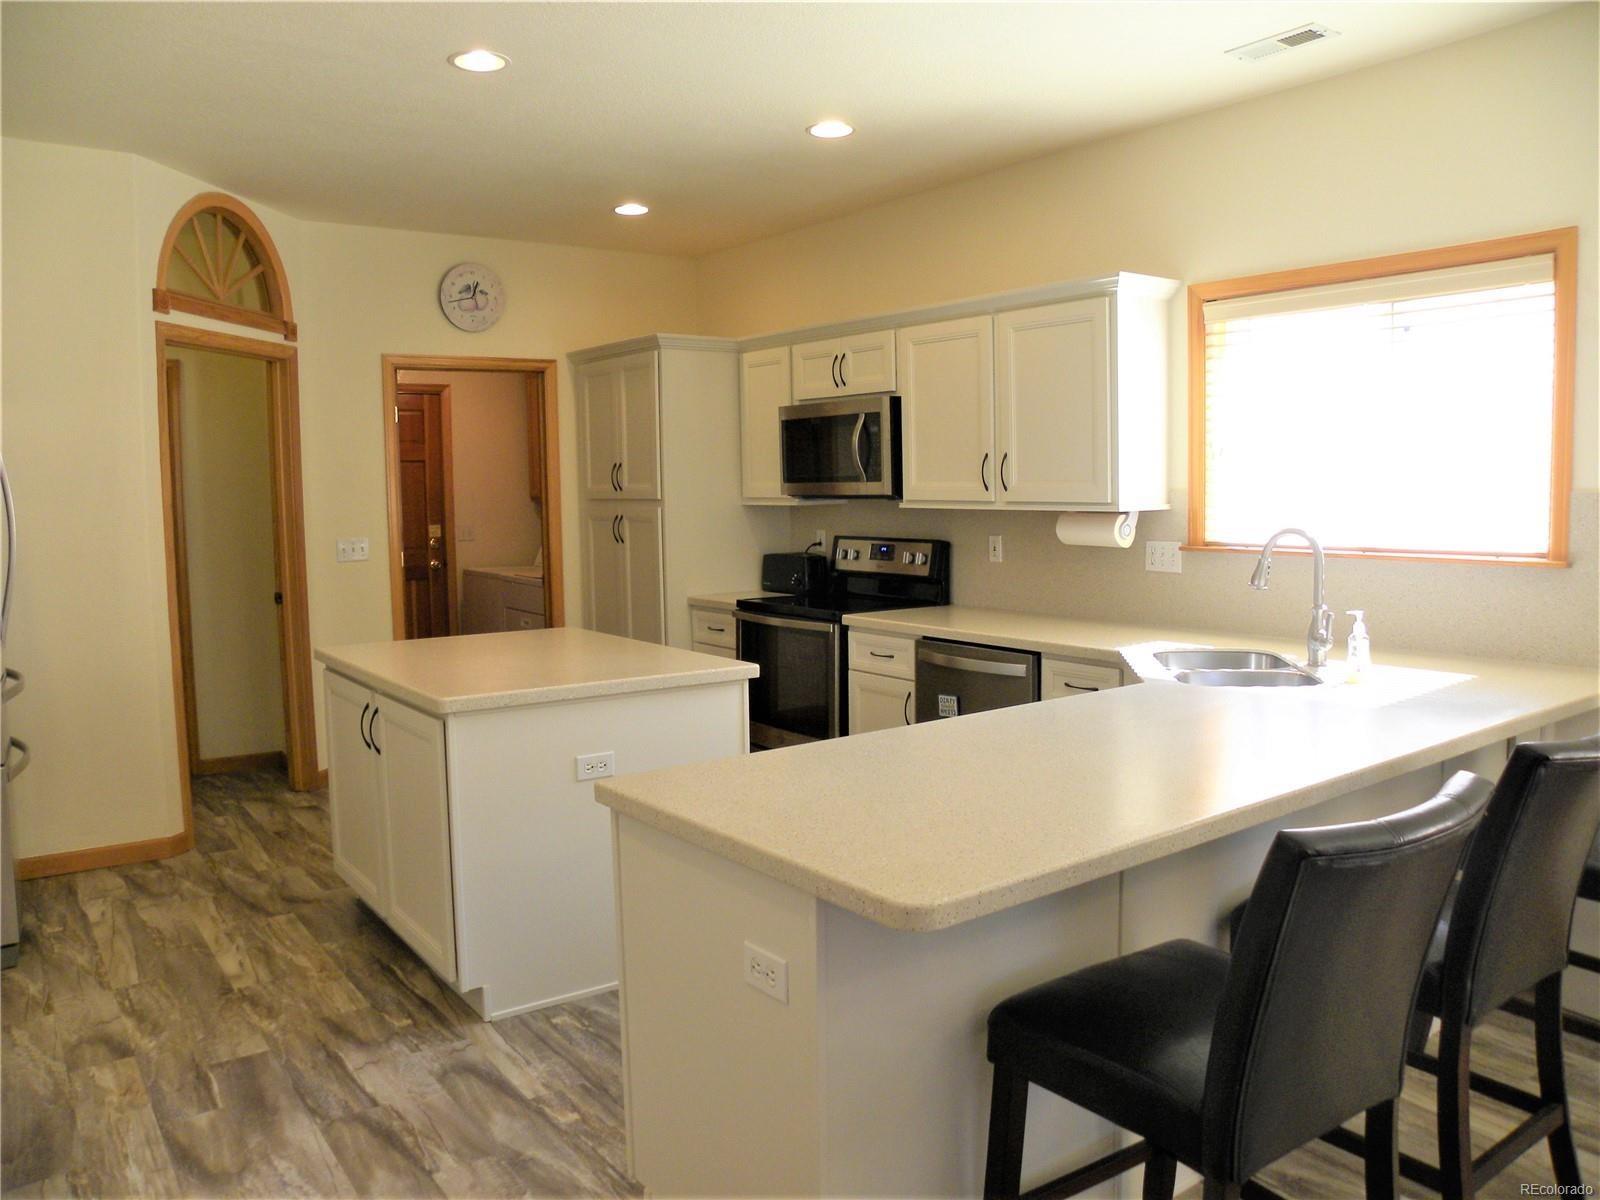 MLS# 5924977 - 4 - 1017 Cedarcrest Drive, Pueblo, CO 81005